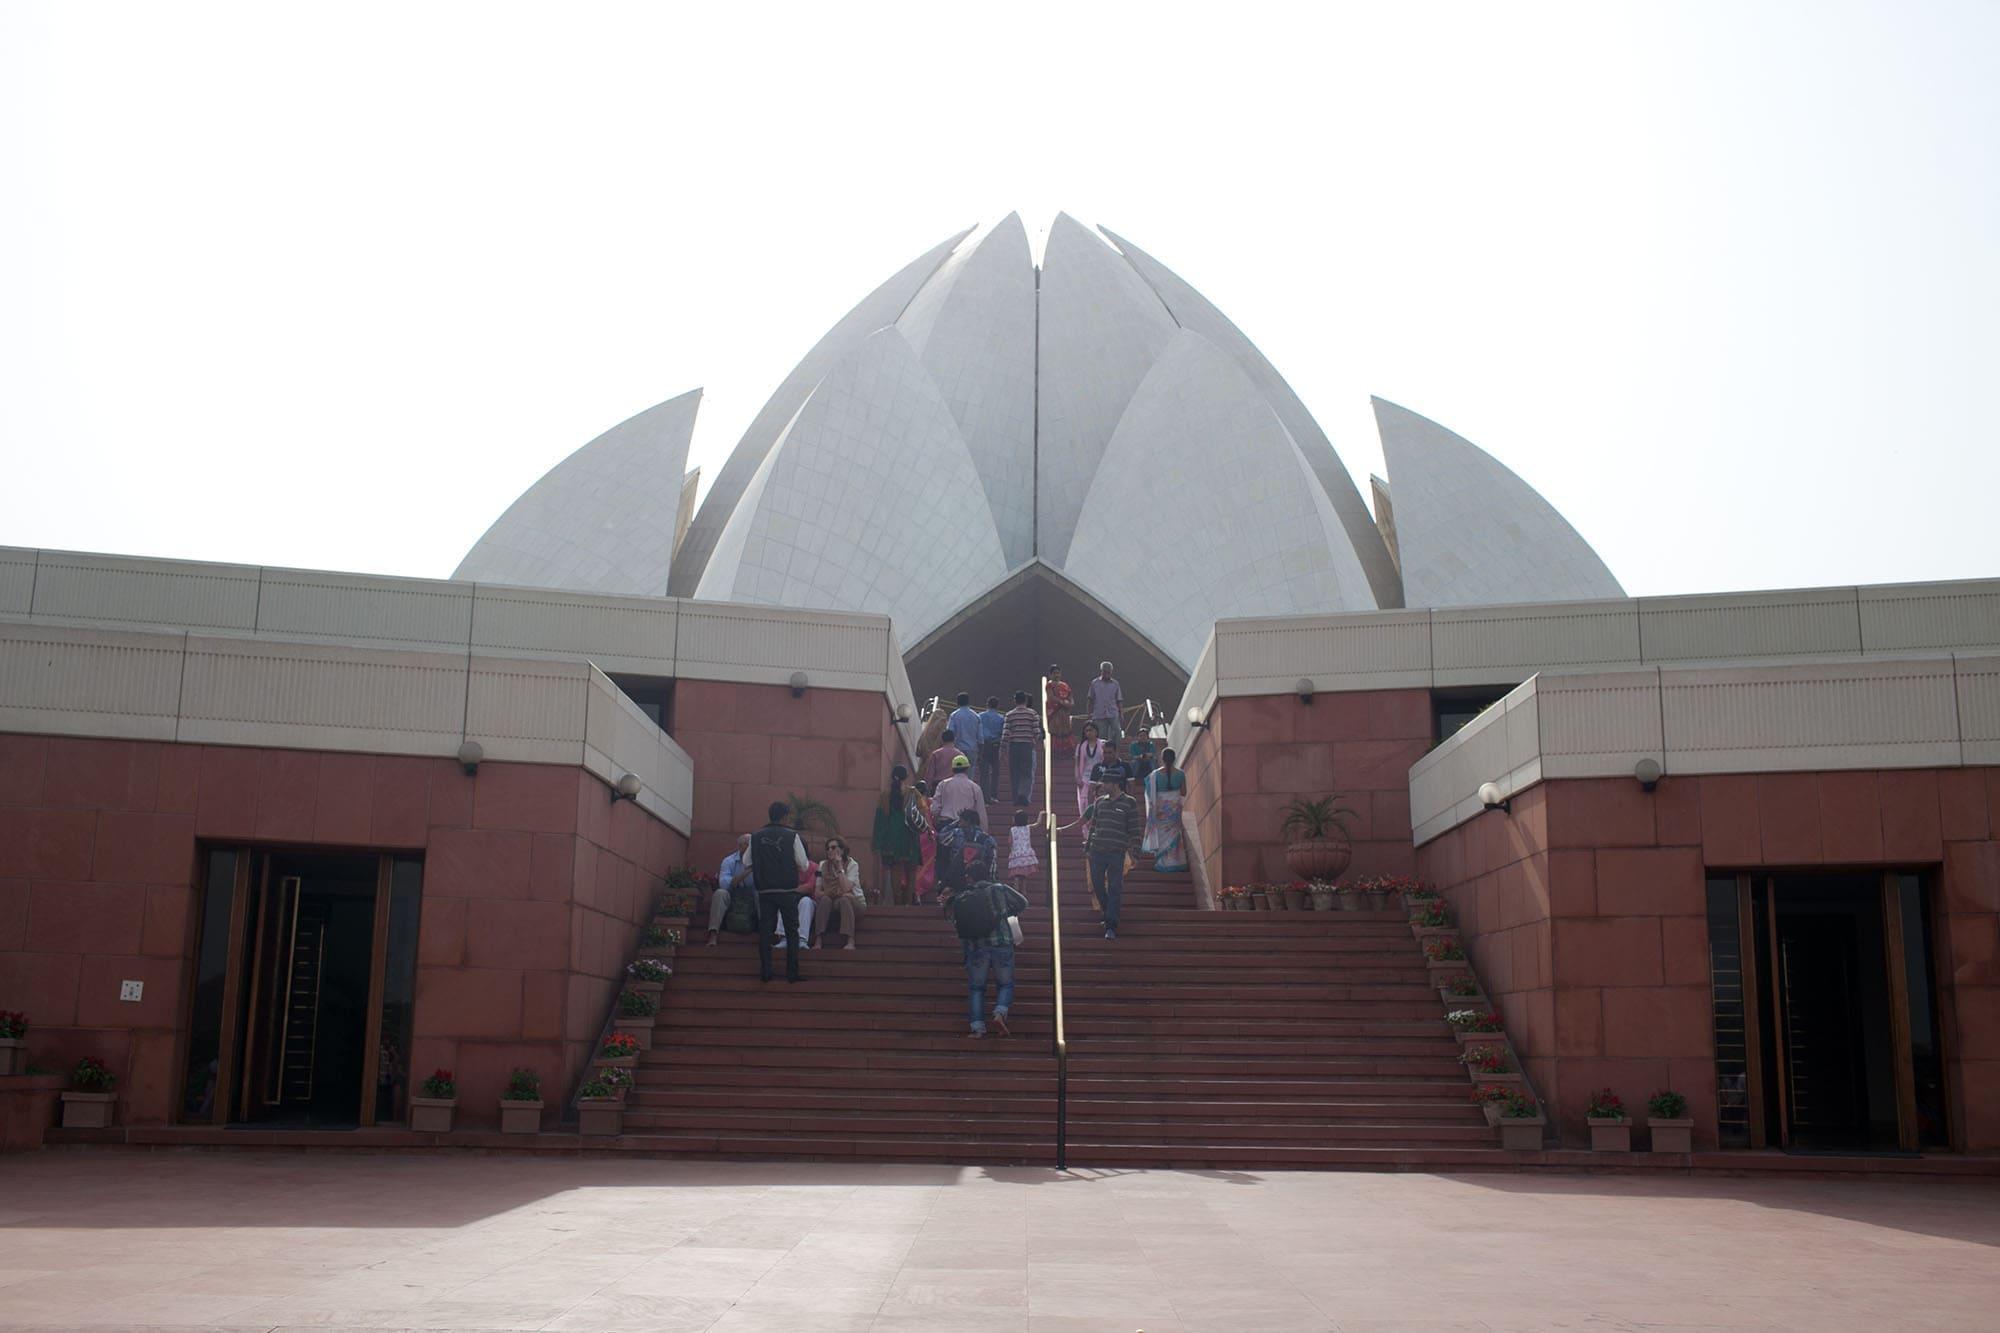 Bahá'í House of Worship - Lotus Temple -  in New Delhi, India.